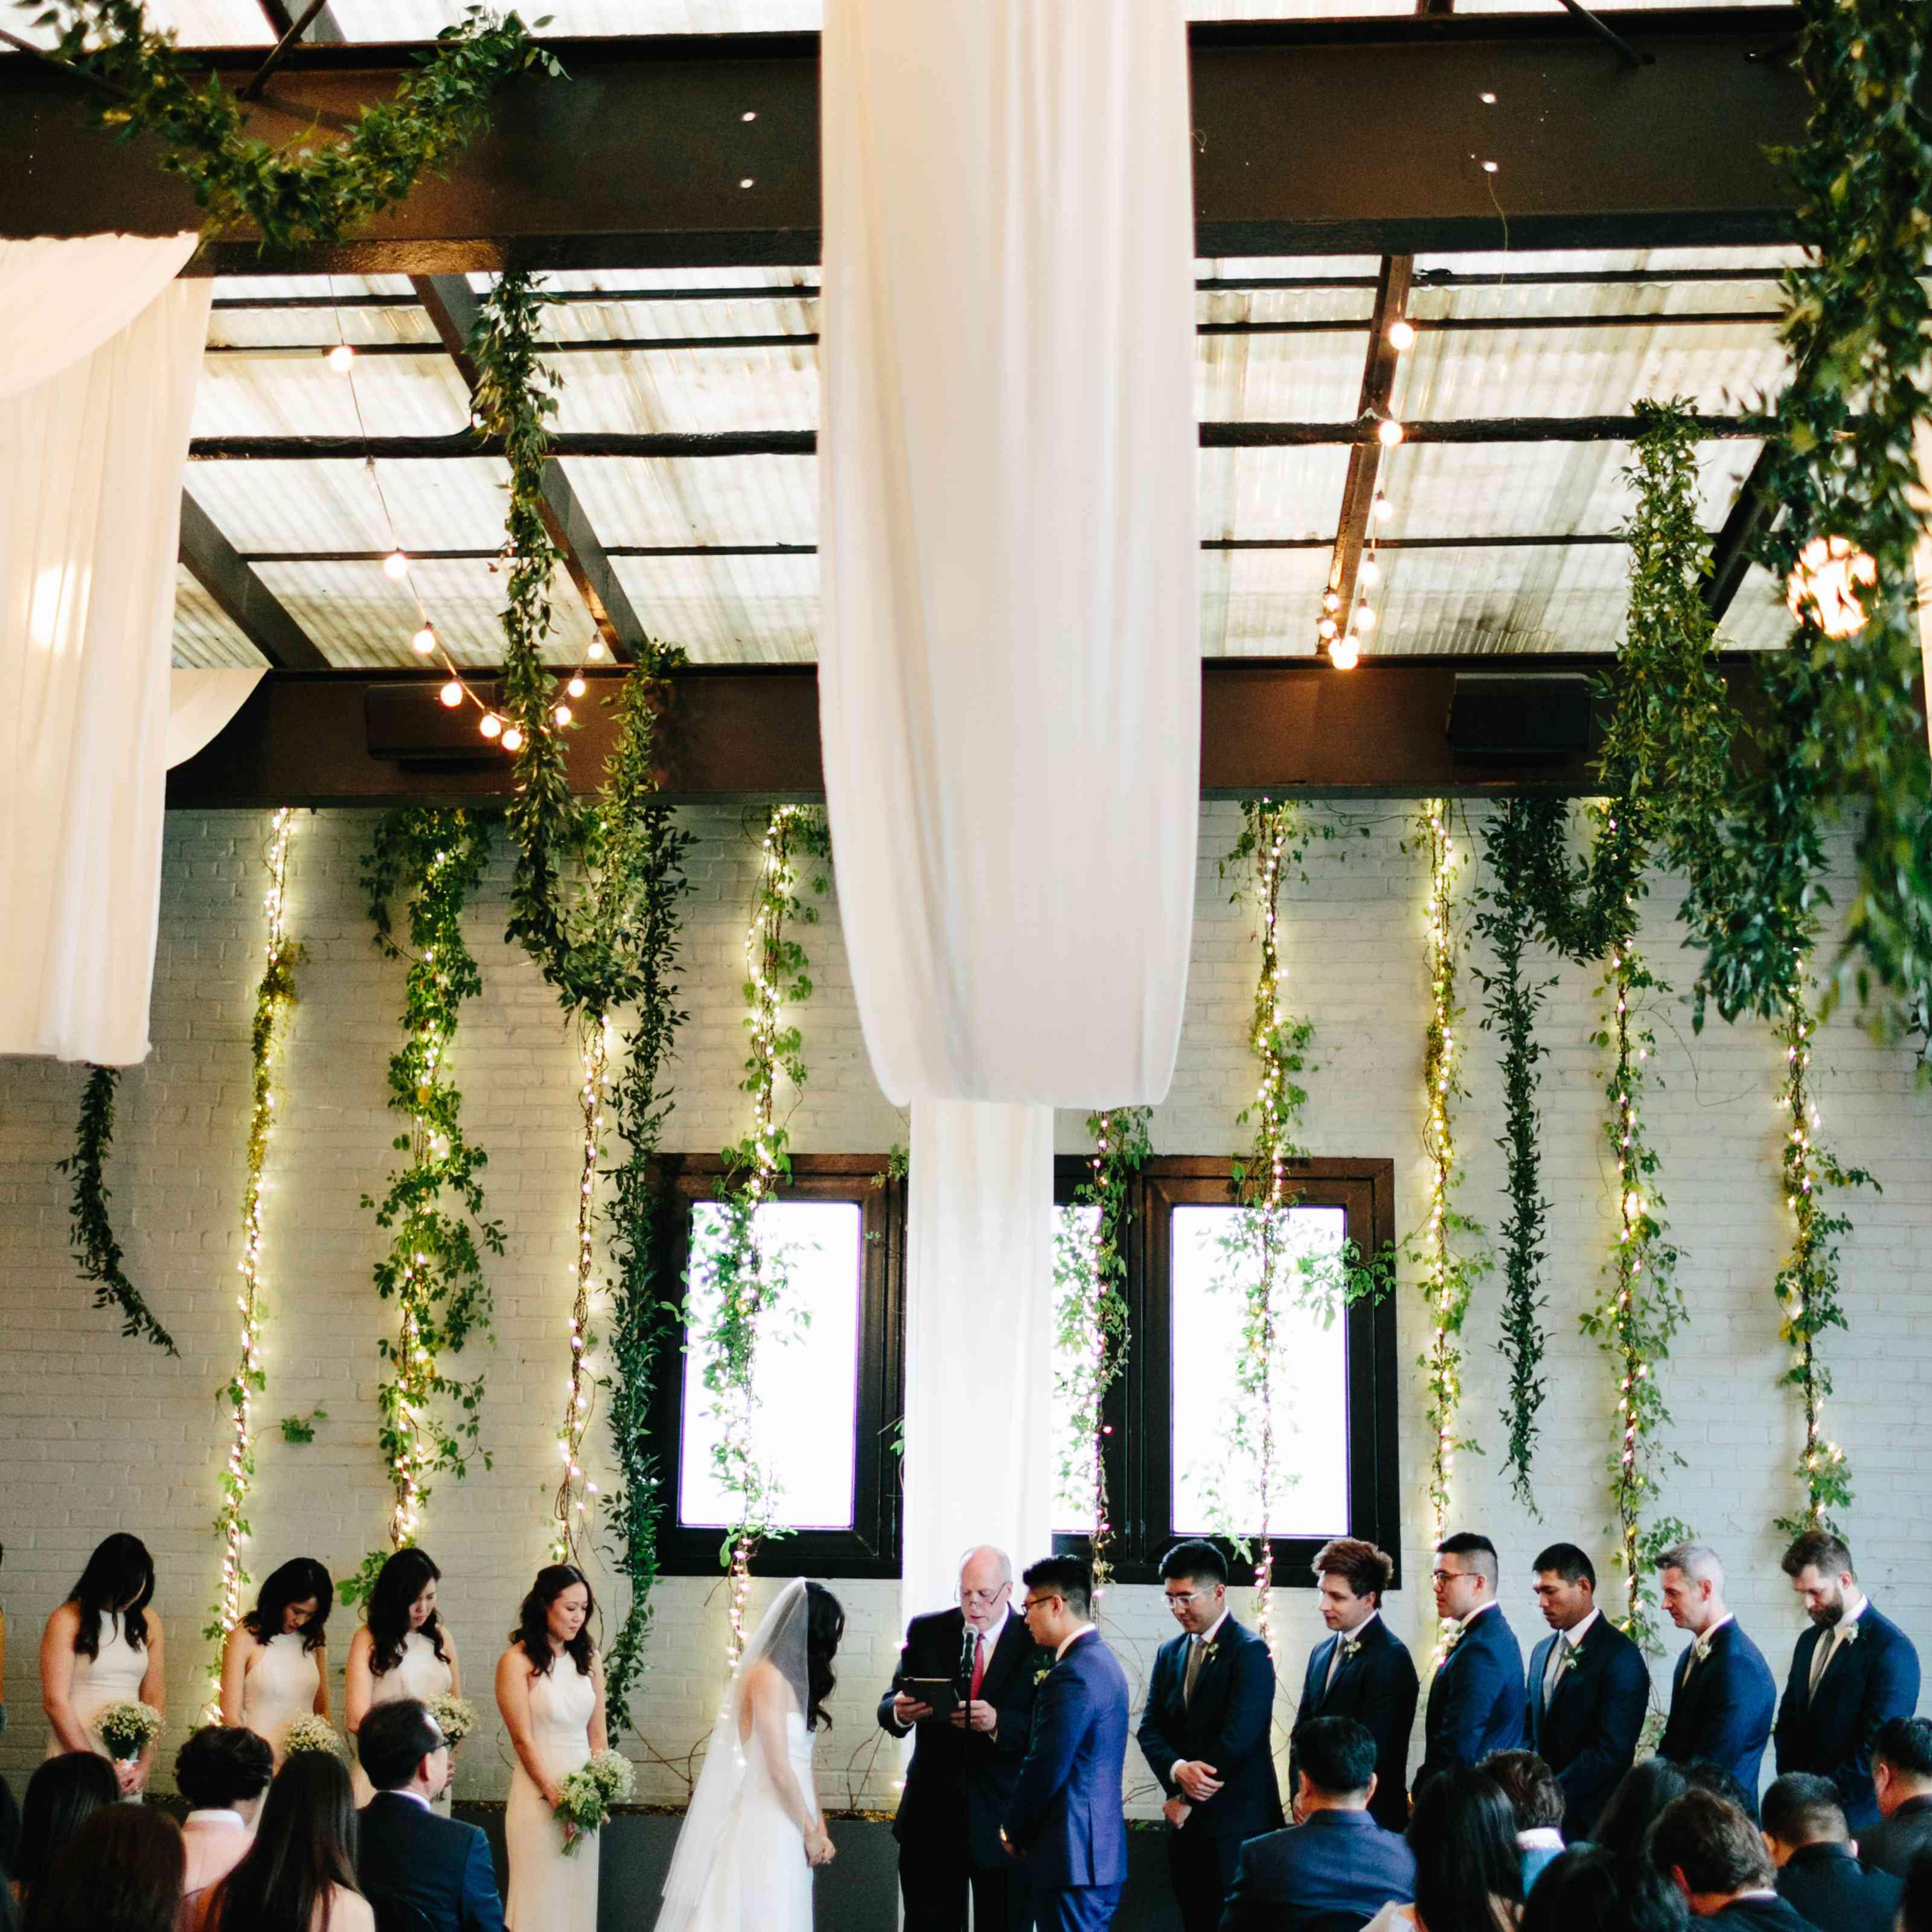 Minimalist wedding reception